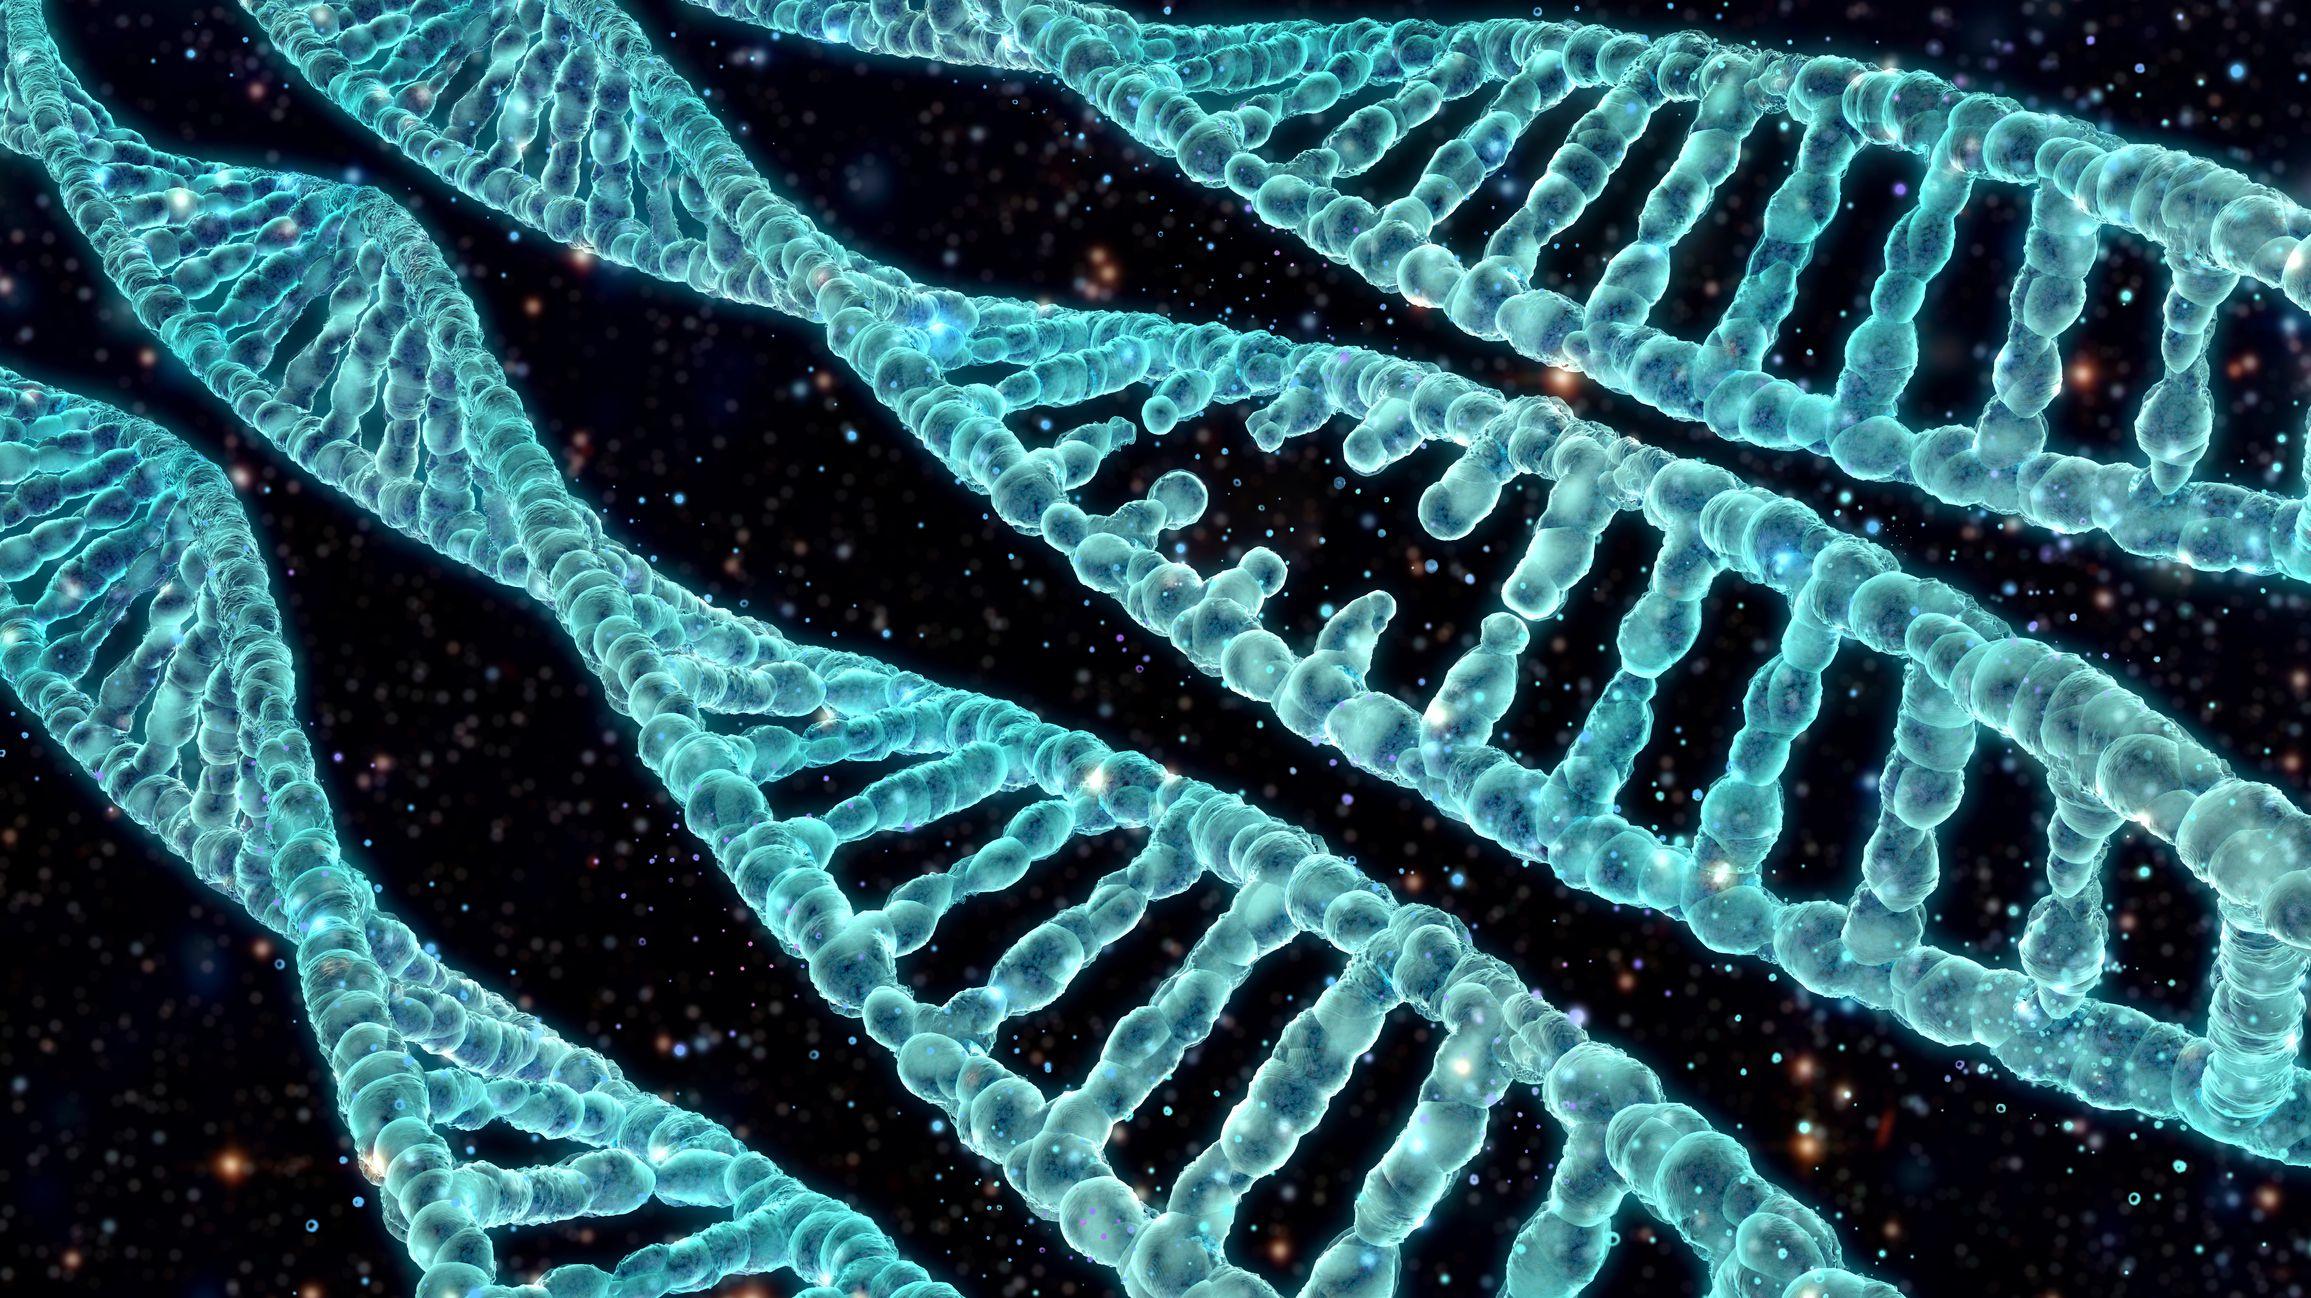 DNA formation